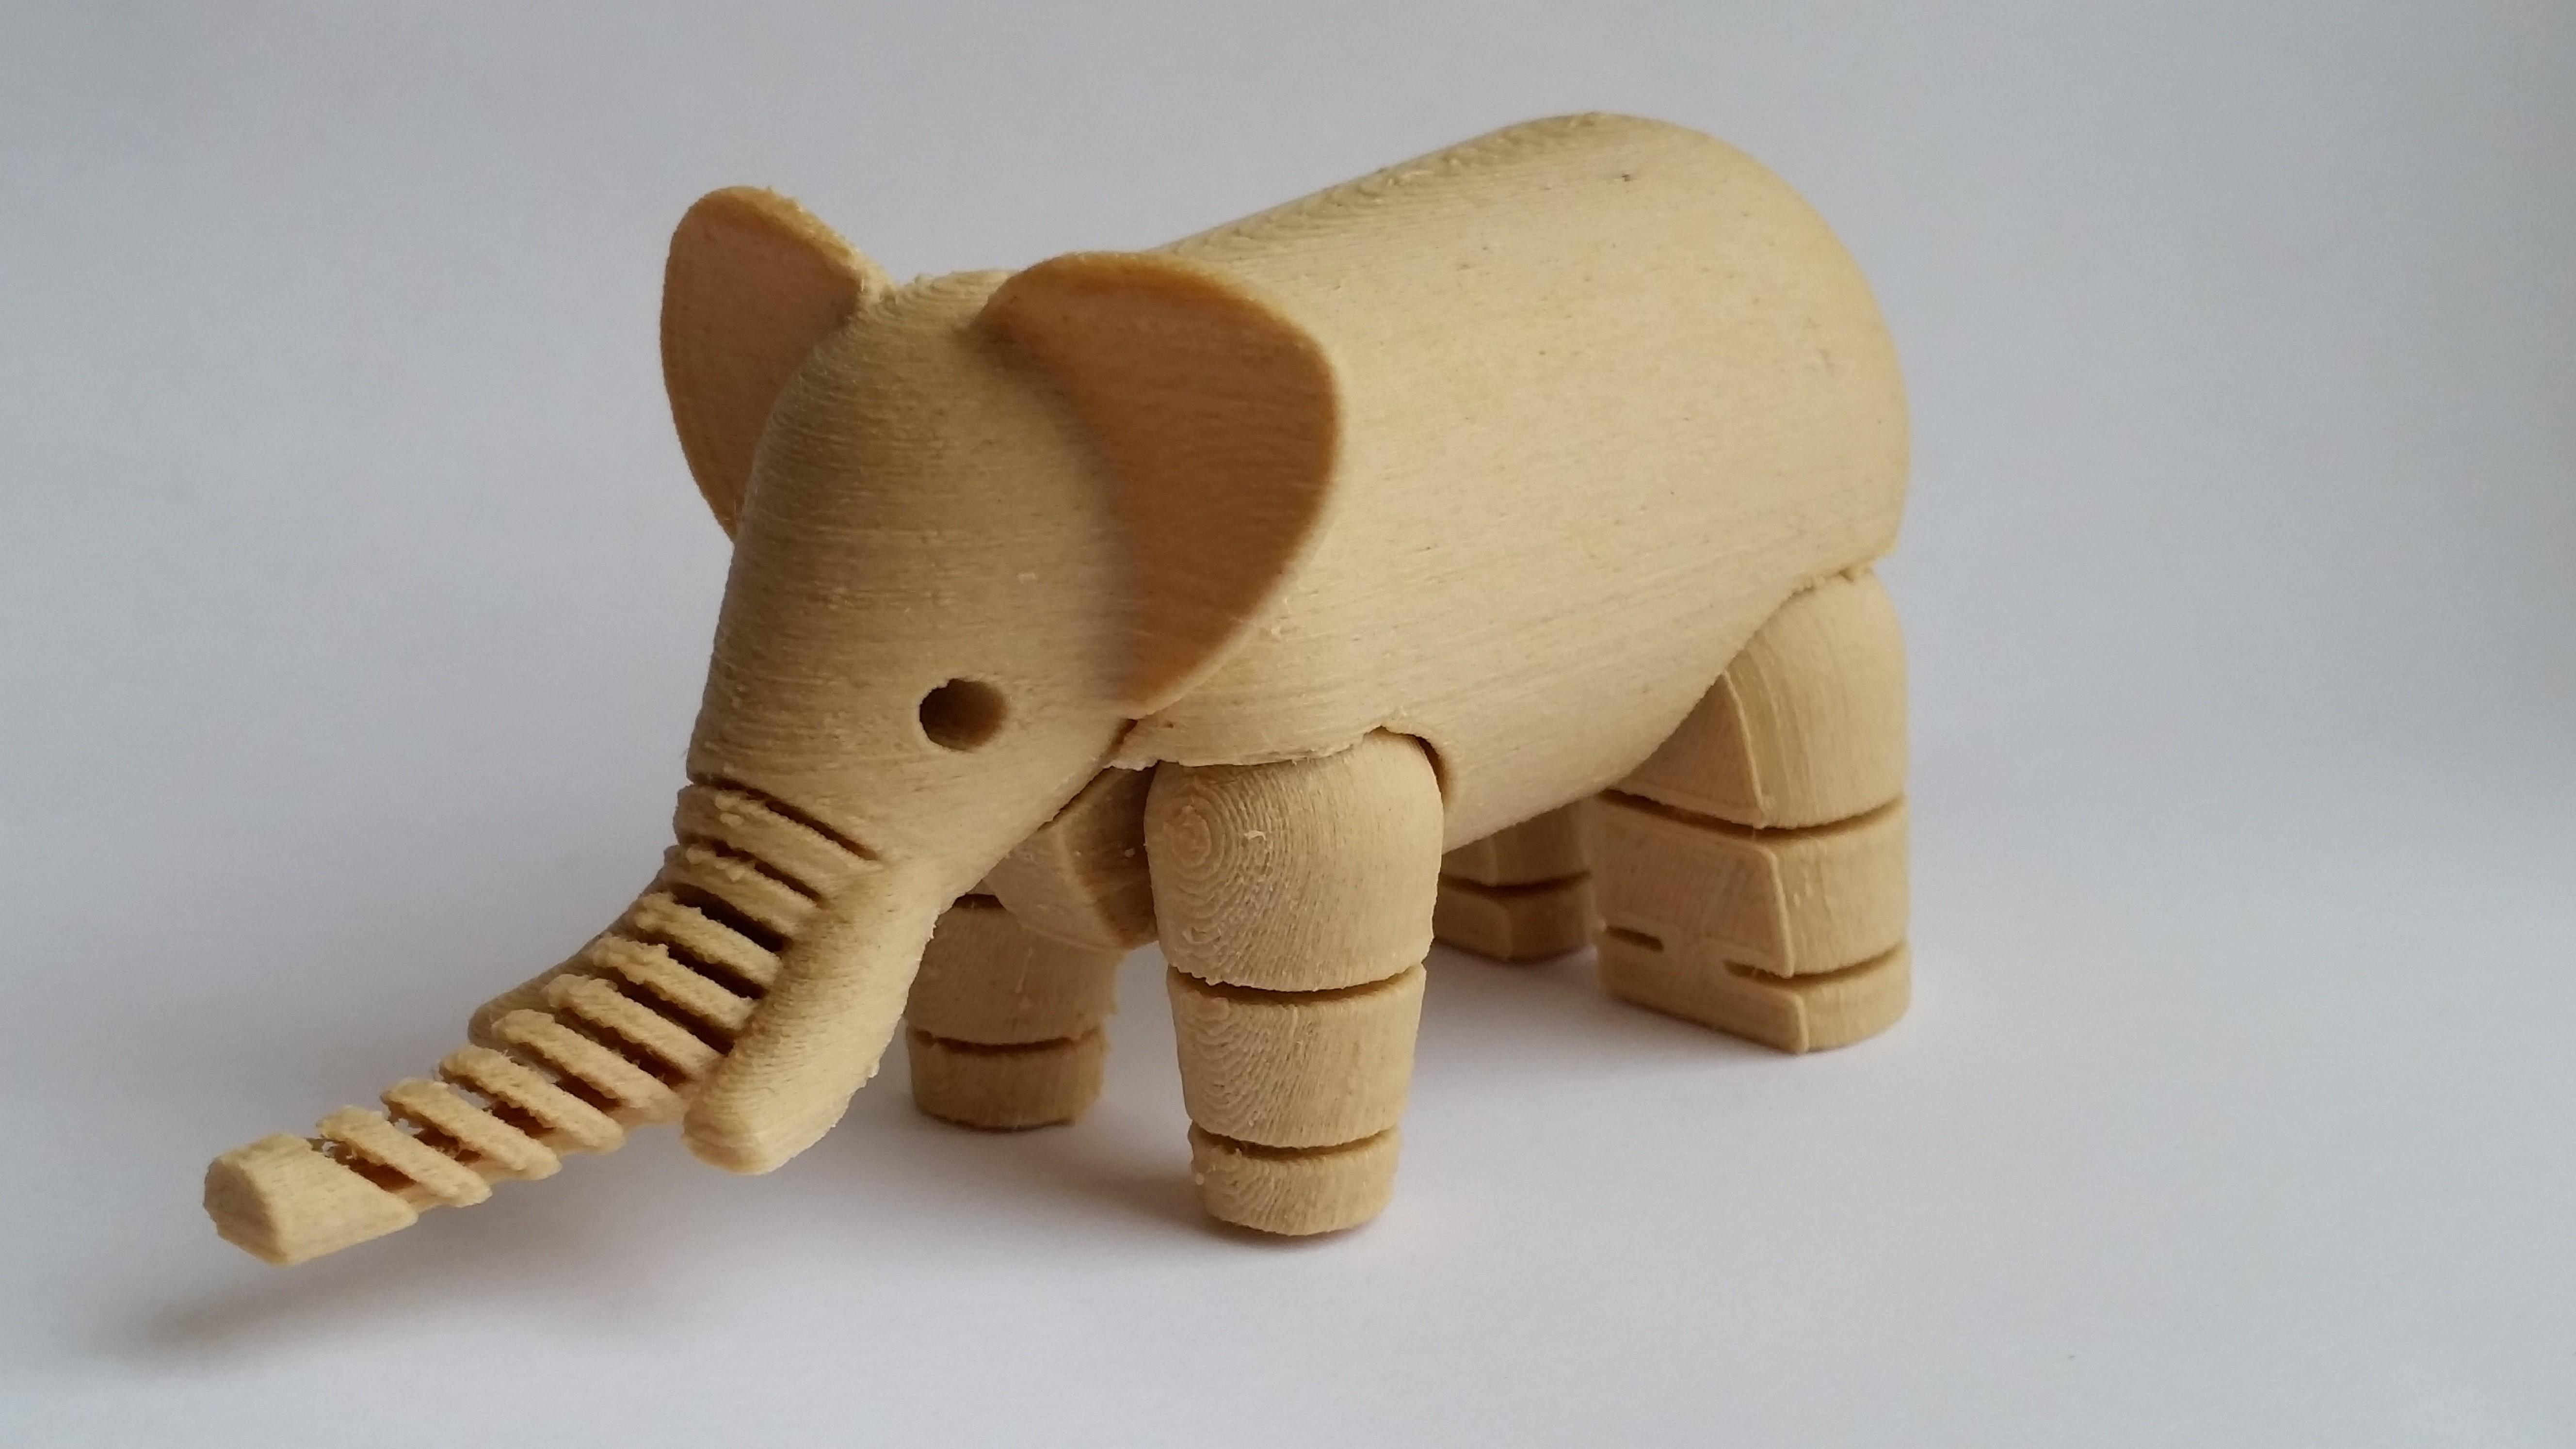 Wood Filament Review - 3D Printing Materials - Feels, Smells Like Wood